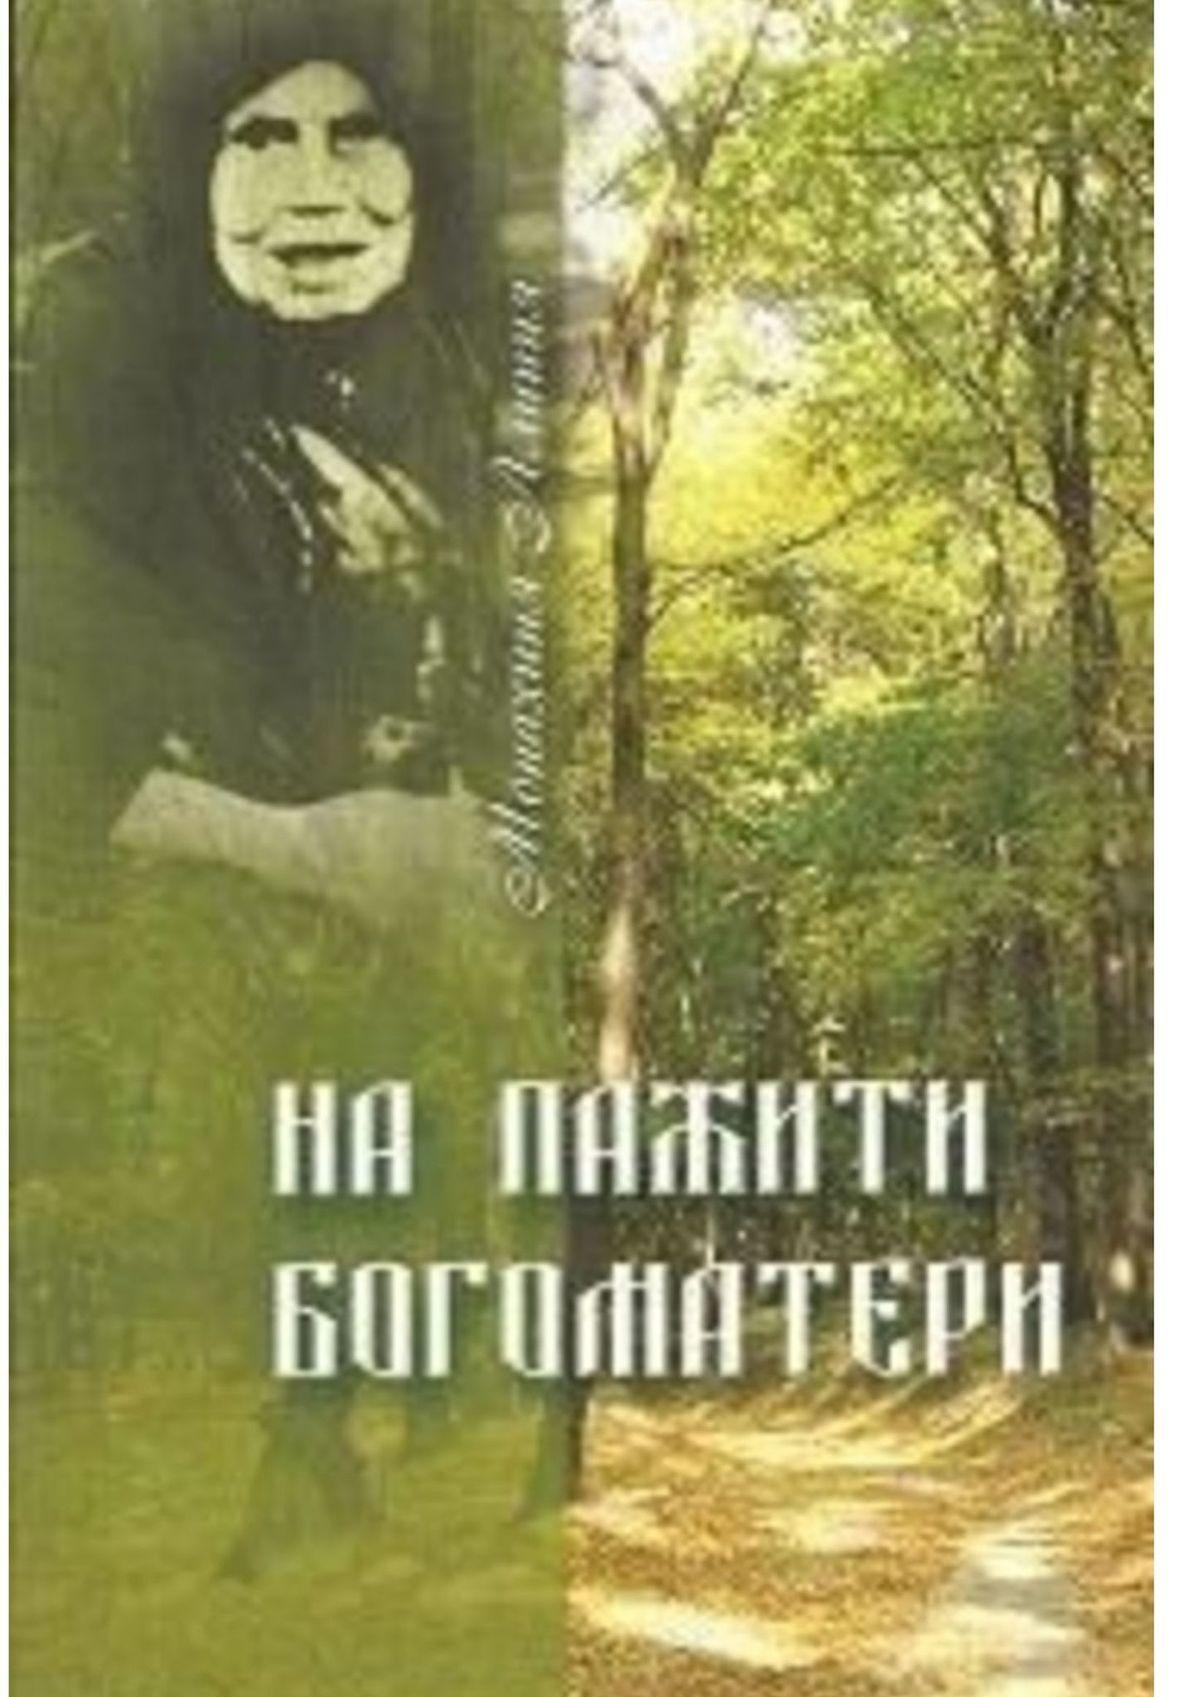 Купить книгу Напажити Богоматери. Монахиня Алипия, автора Ларисы Александровны Некрашевич